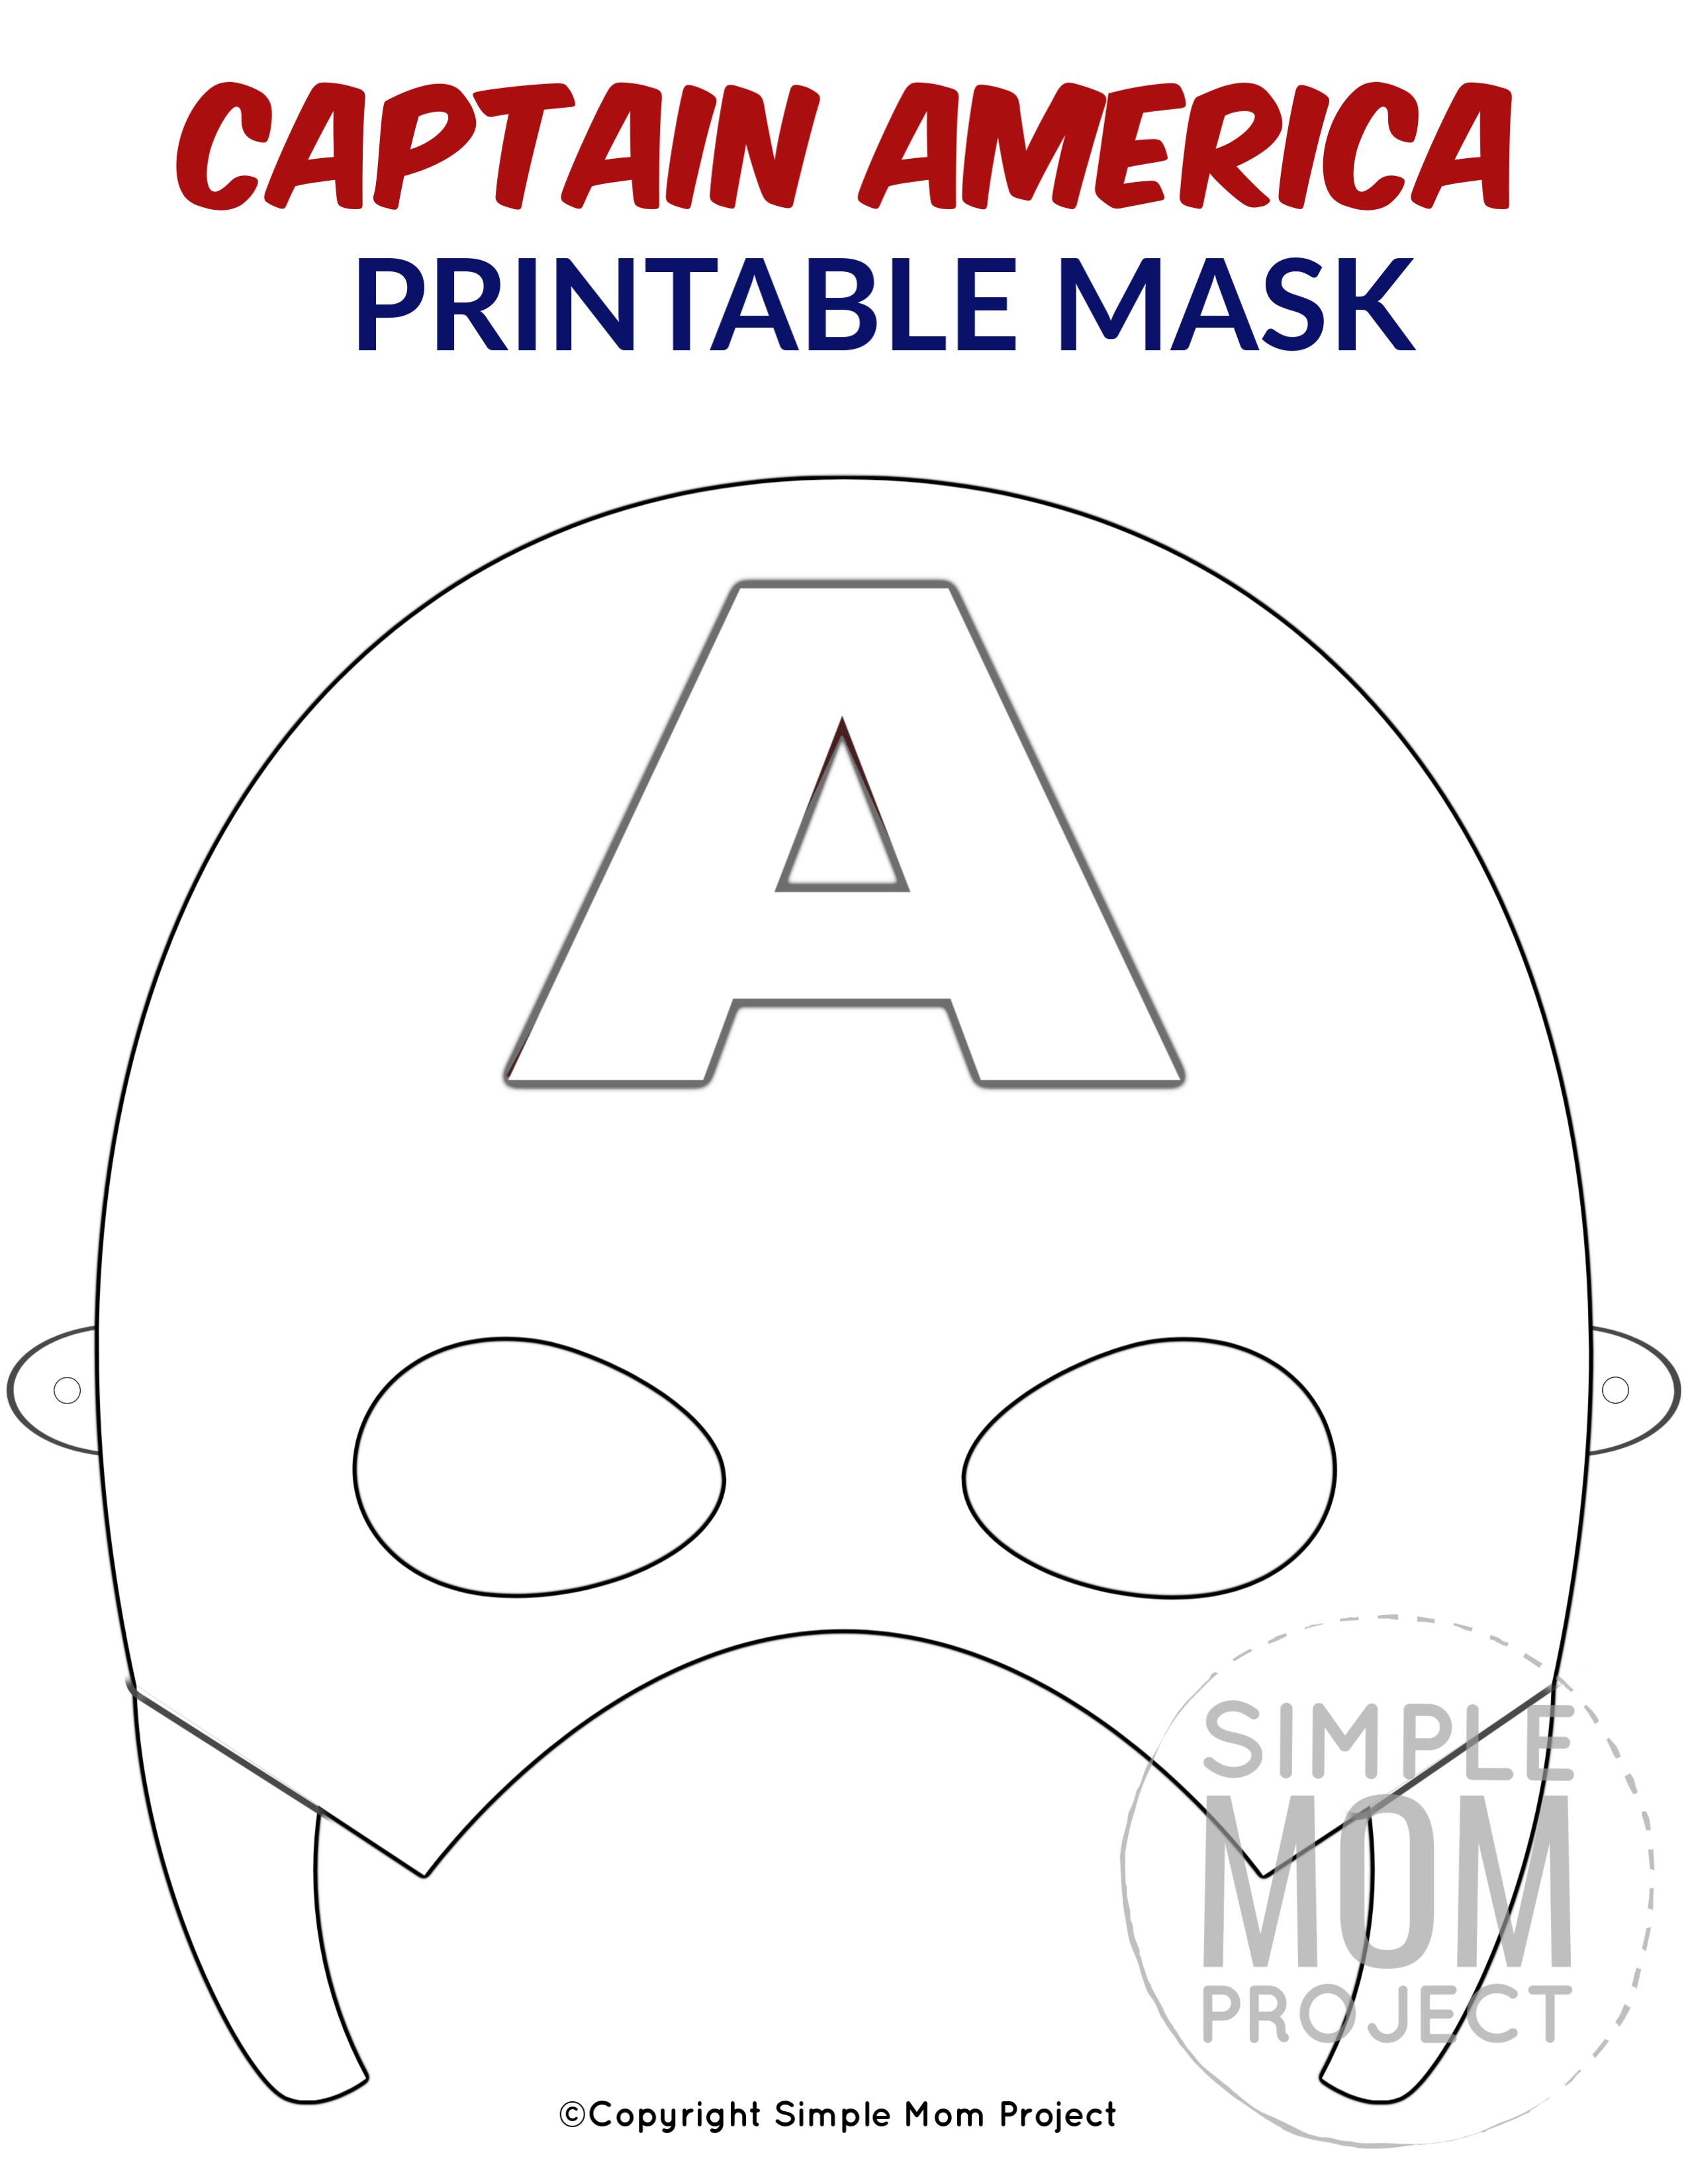 Free Printable Captain America Mask Template Captain America Coloring Pages Captain America Mask Superhero Mask Template